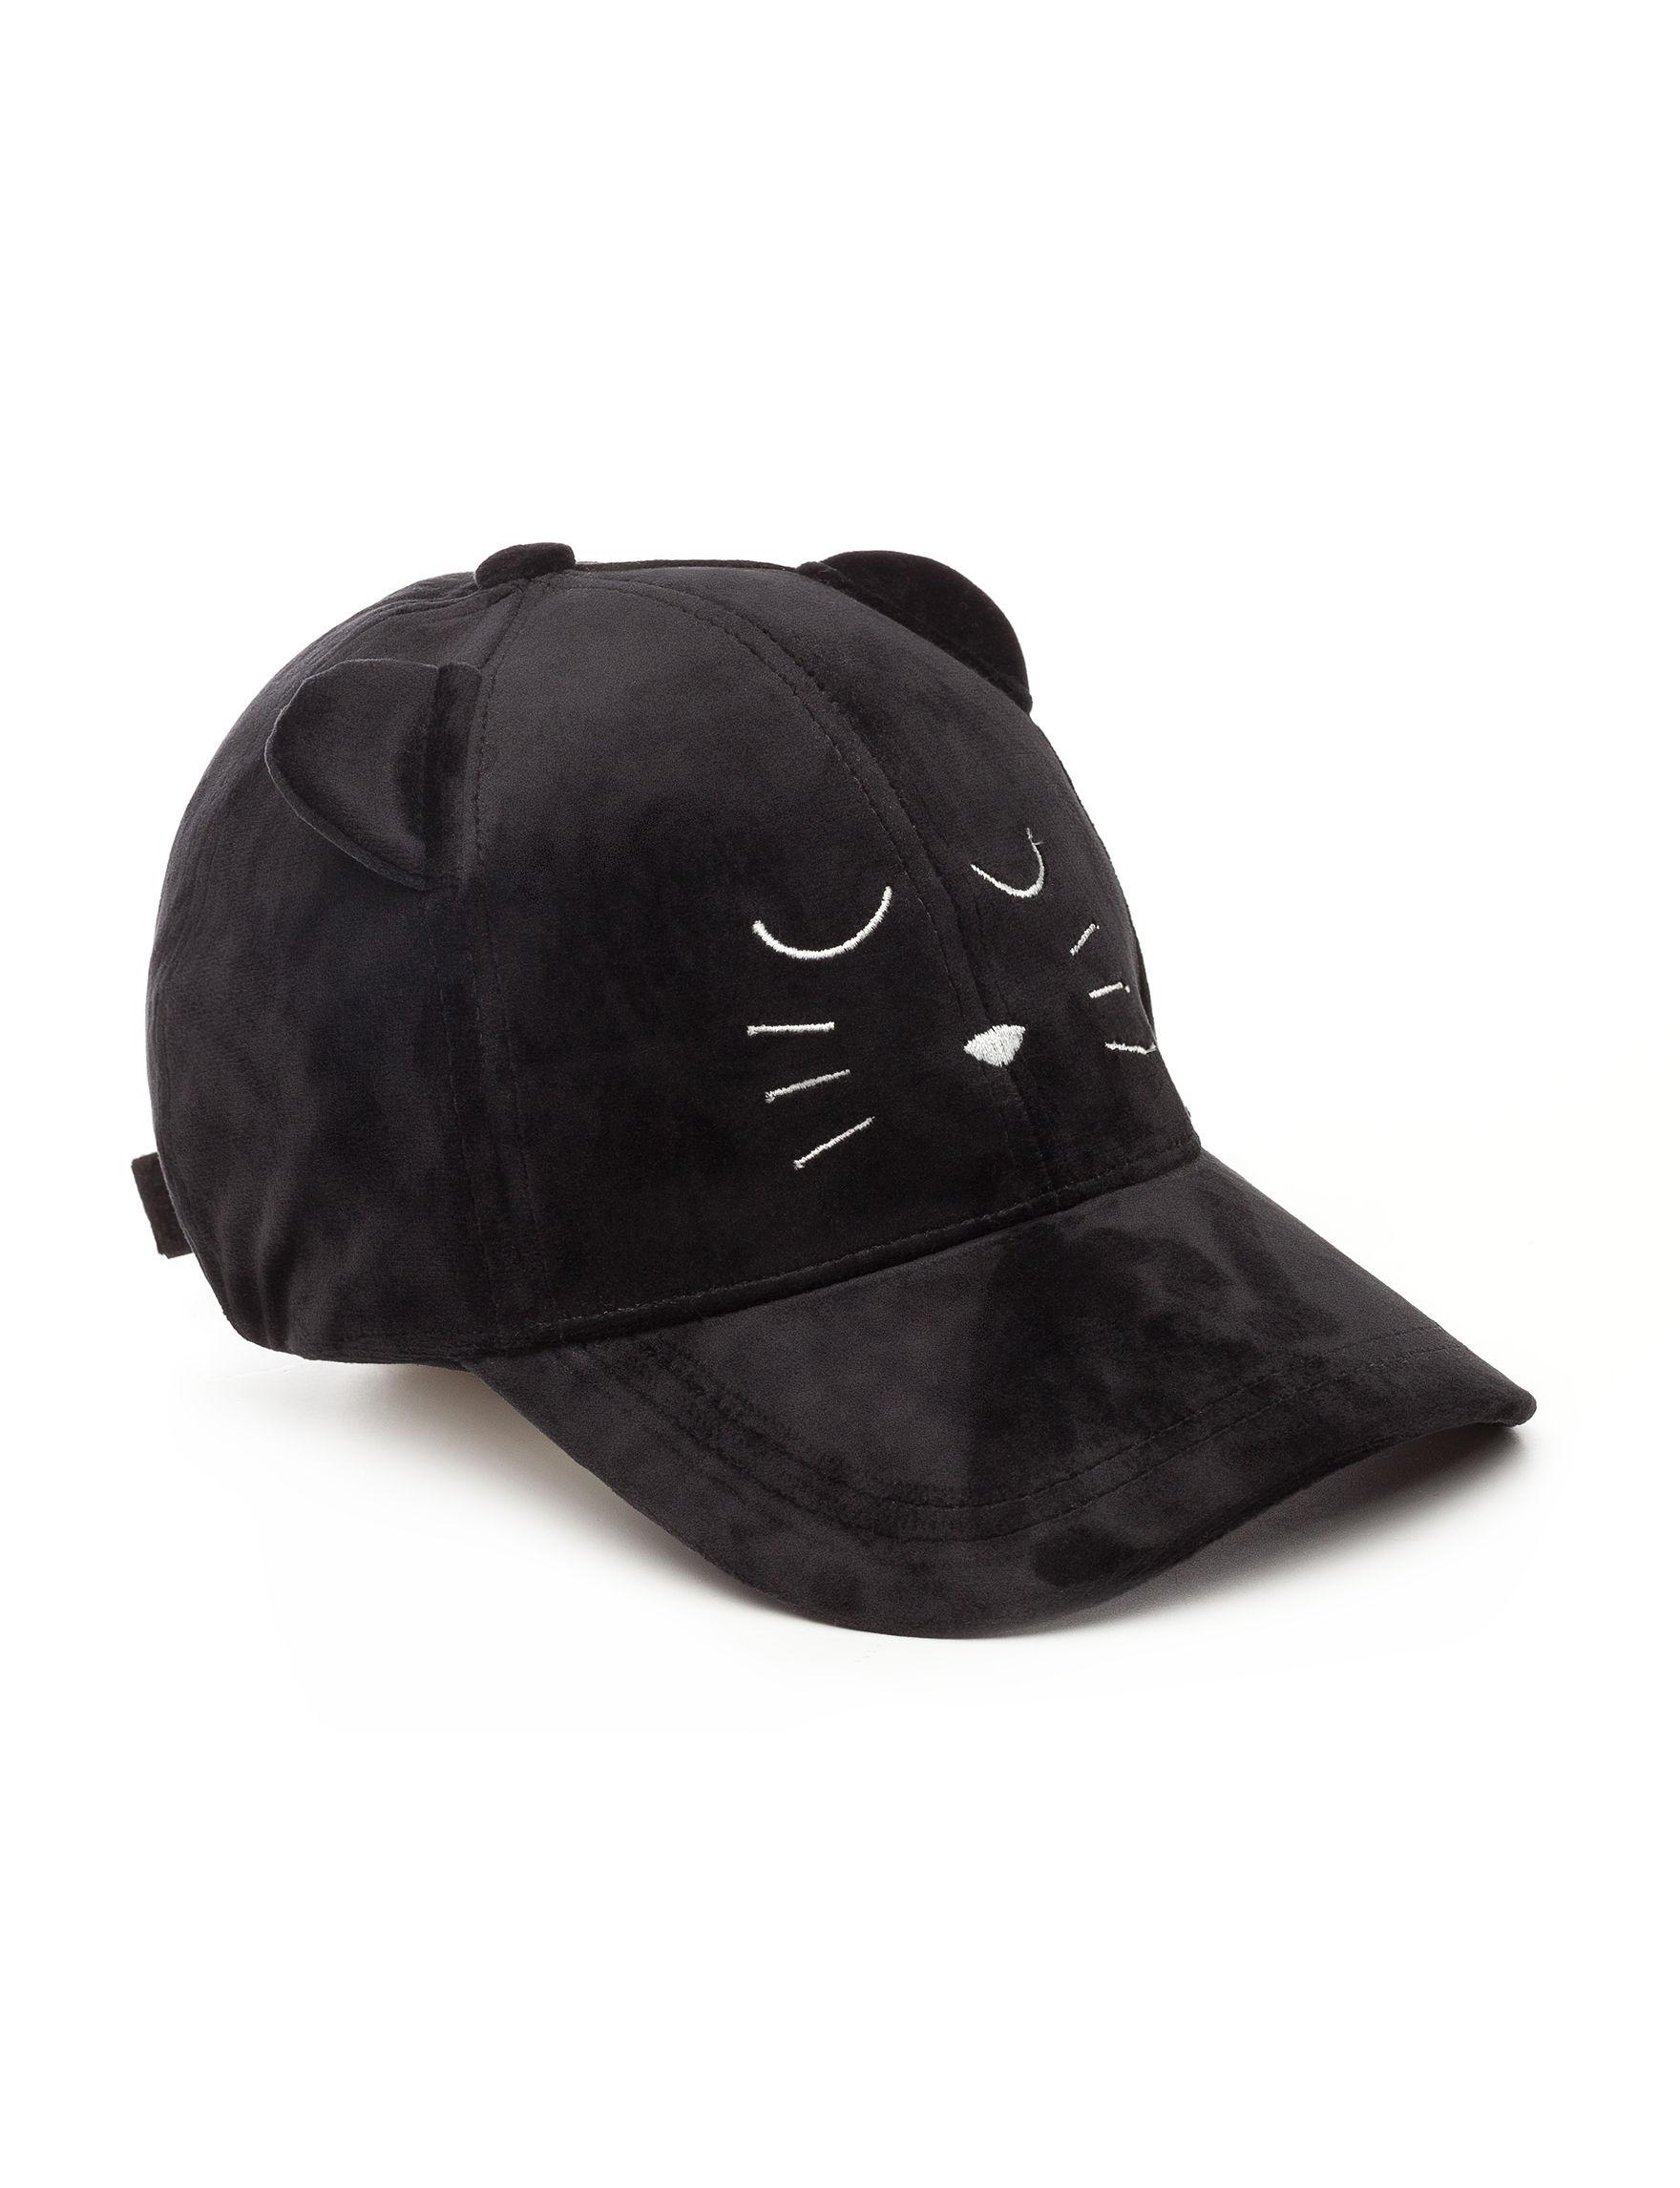 David & Young Black Hats & Headwear